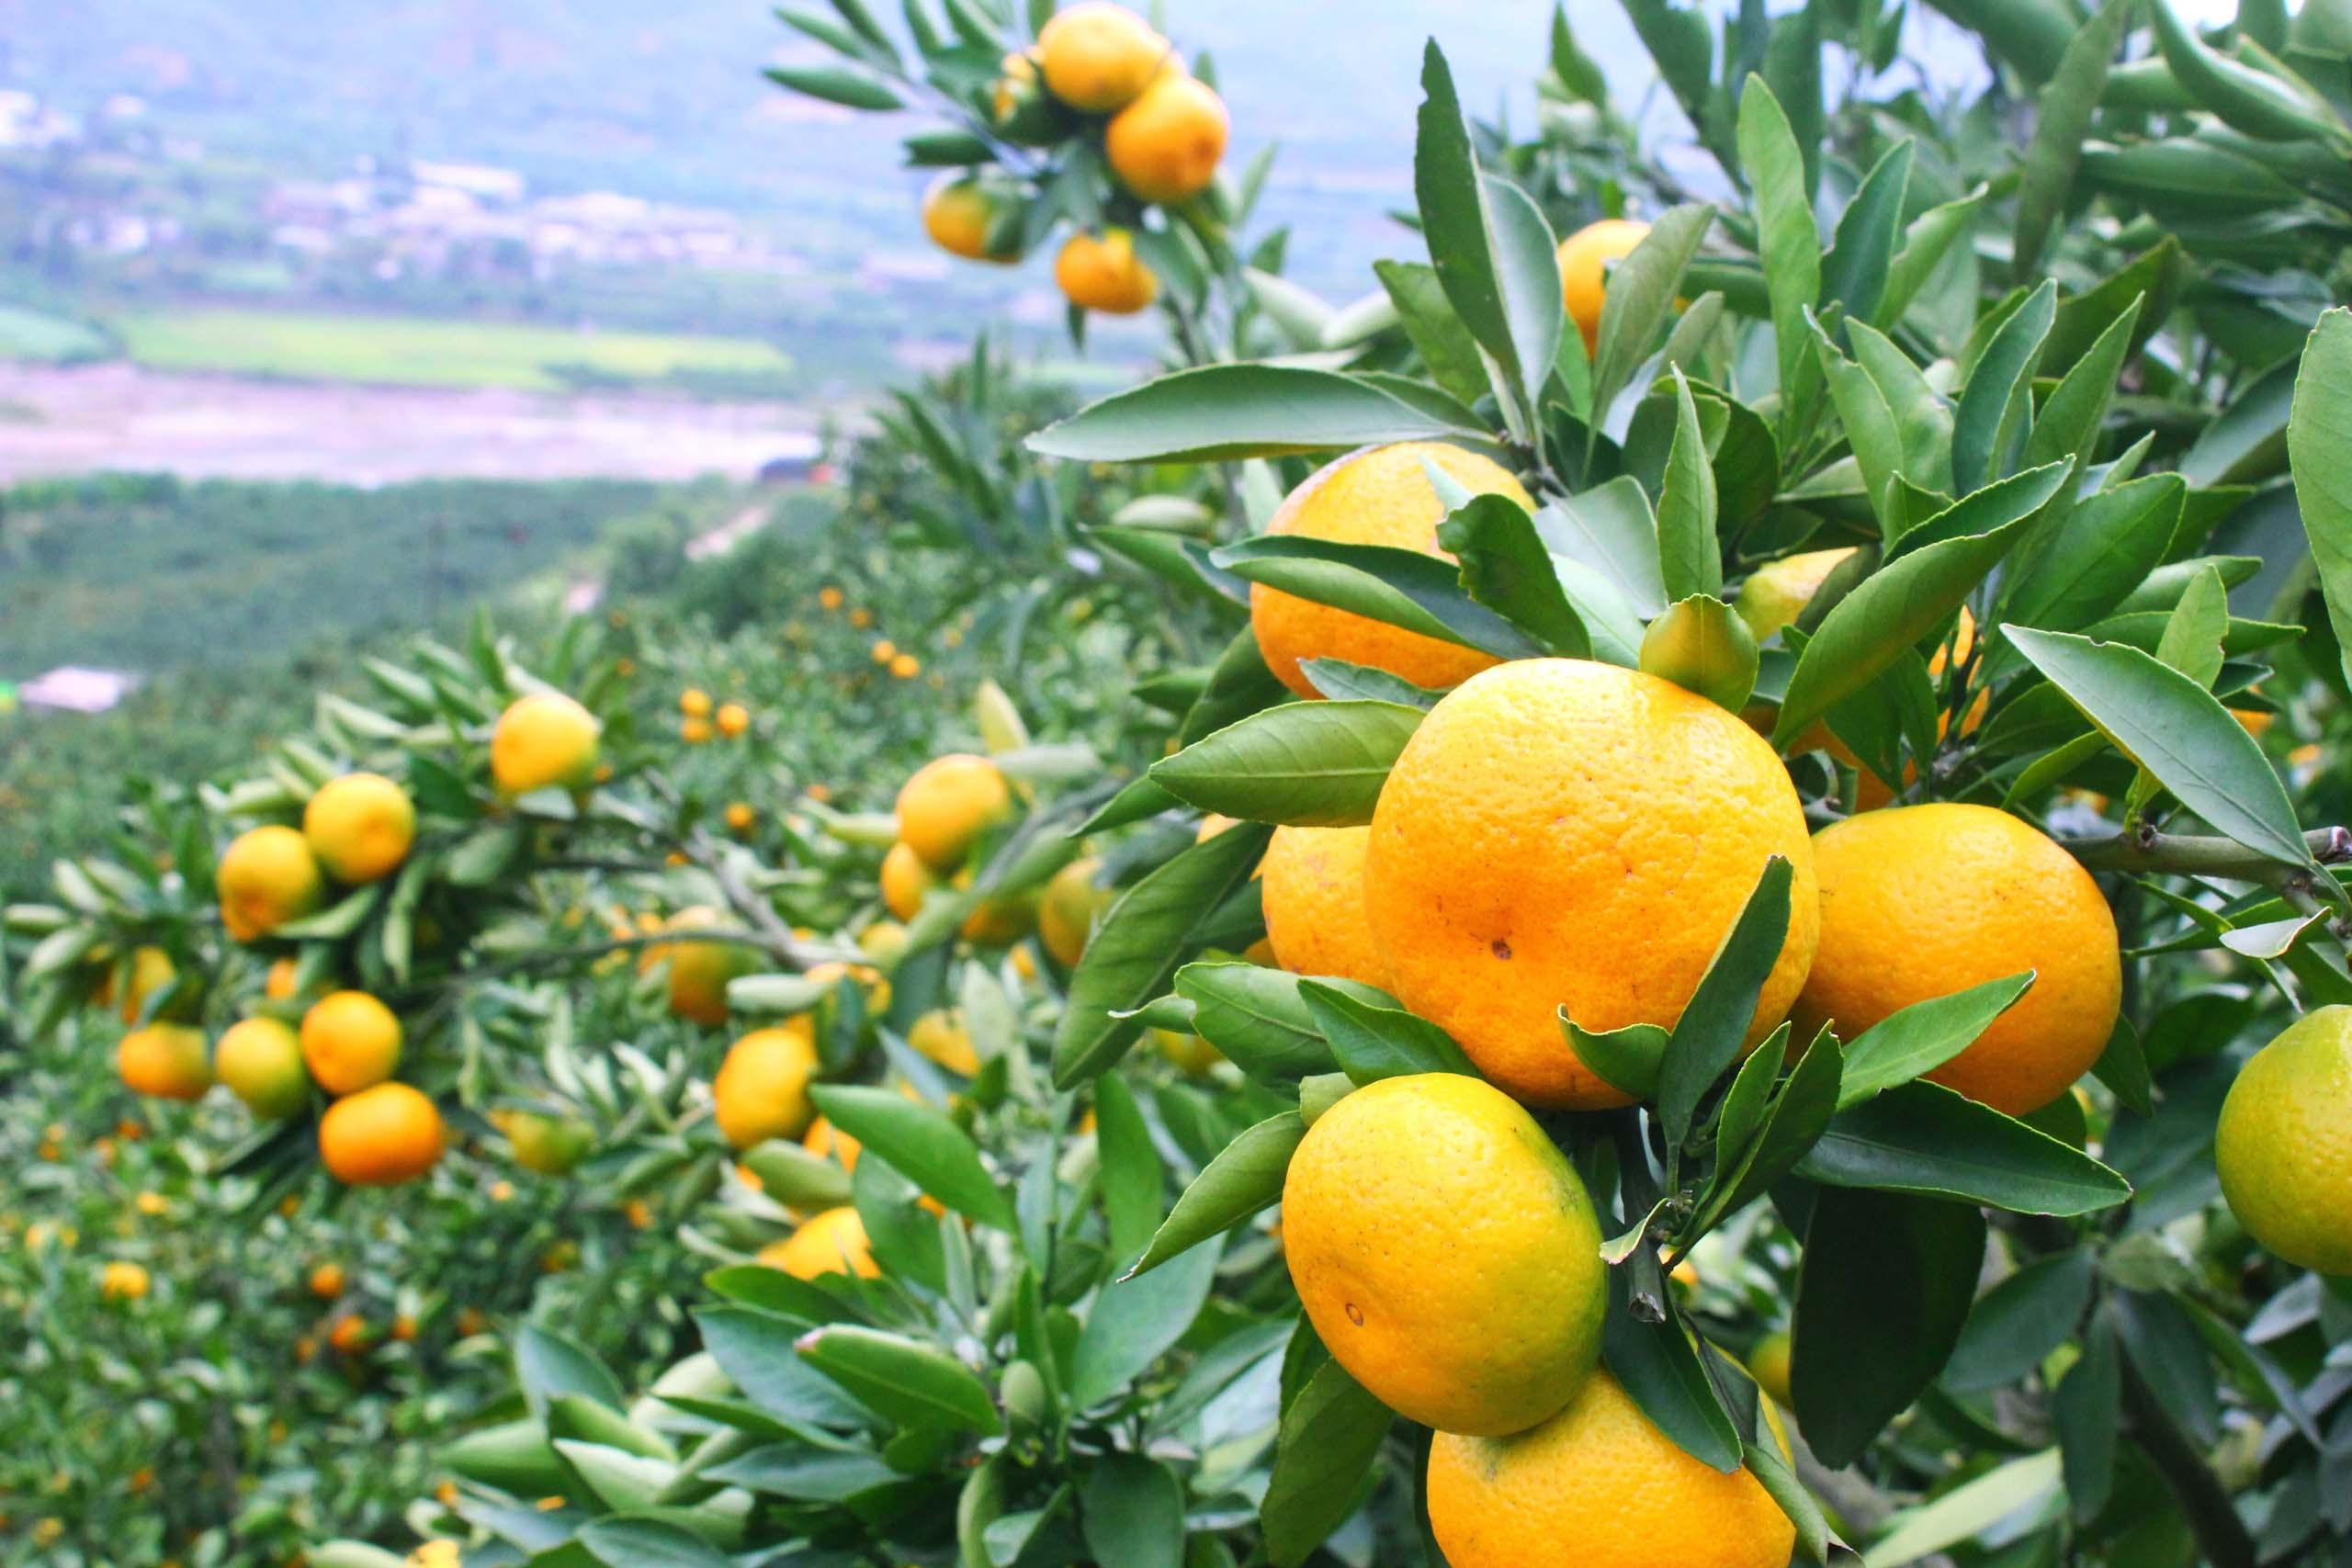 New citrus crop in Italy